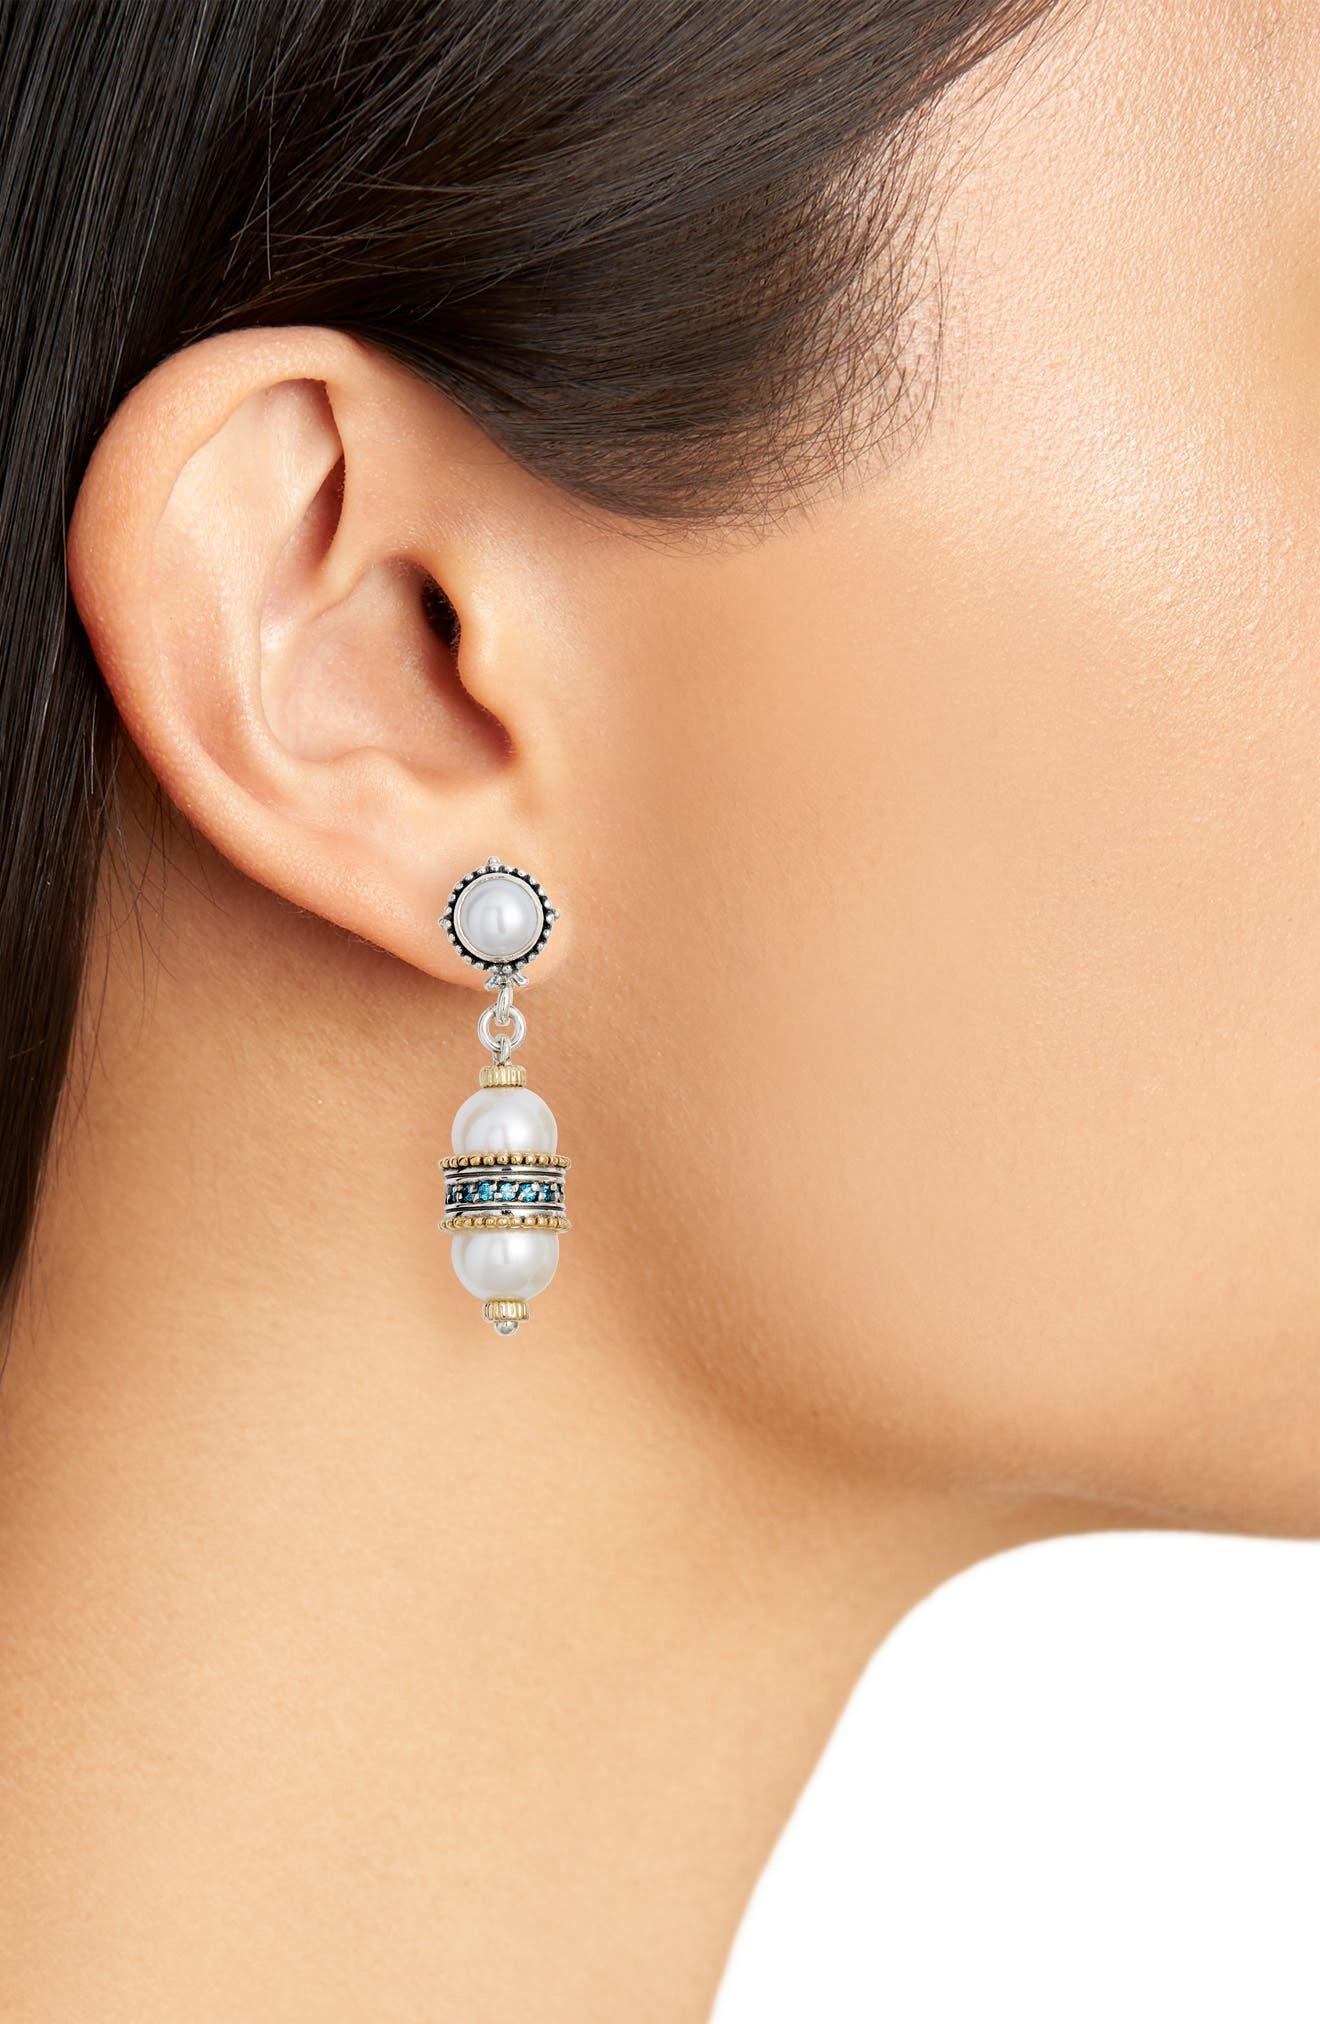 Thalia Double Pearl Drop Earrings,                             Alternate thumbnail 2, color,                             SILVER/ PEARL